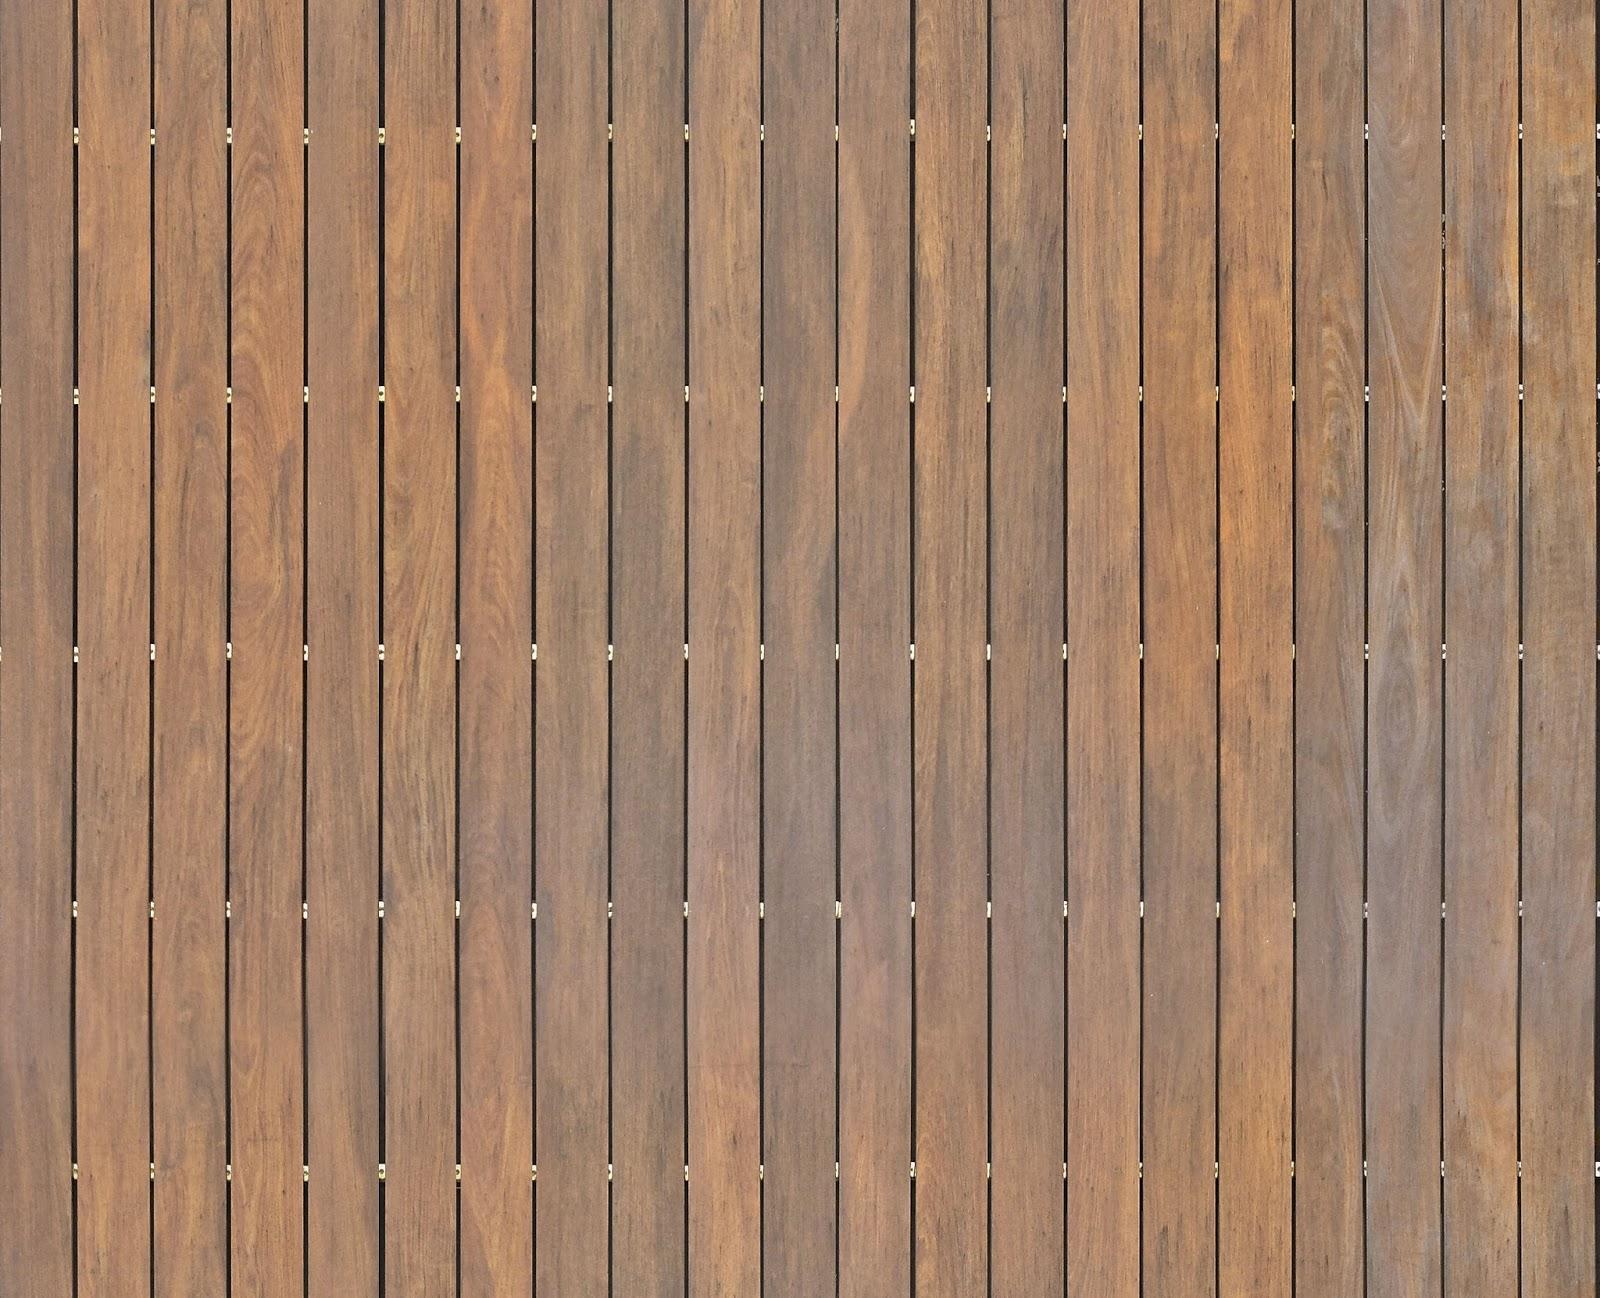 Tileable Wooden Deck Boards Texture Maps Texturise